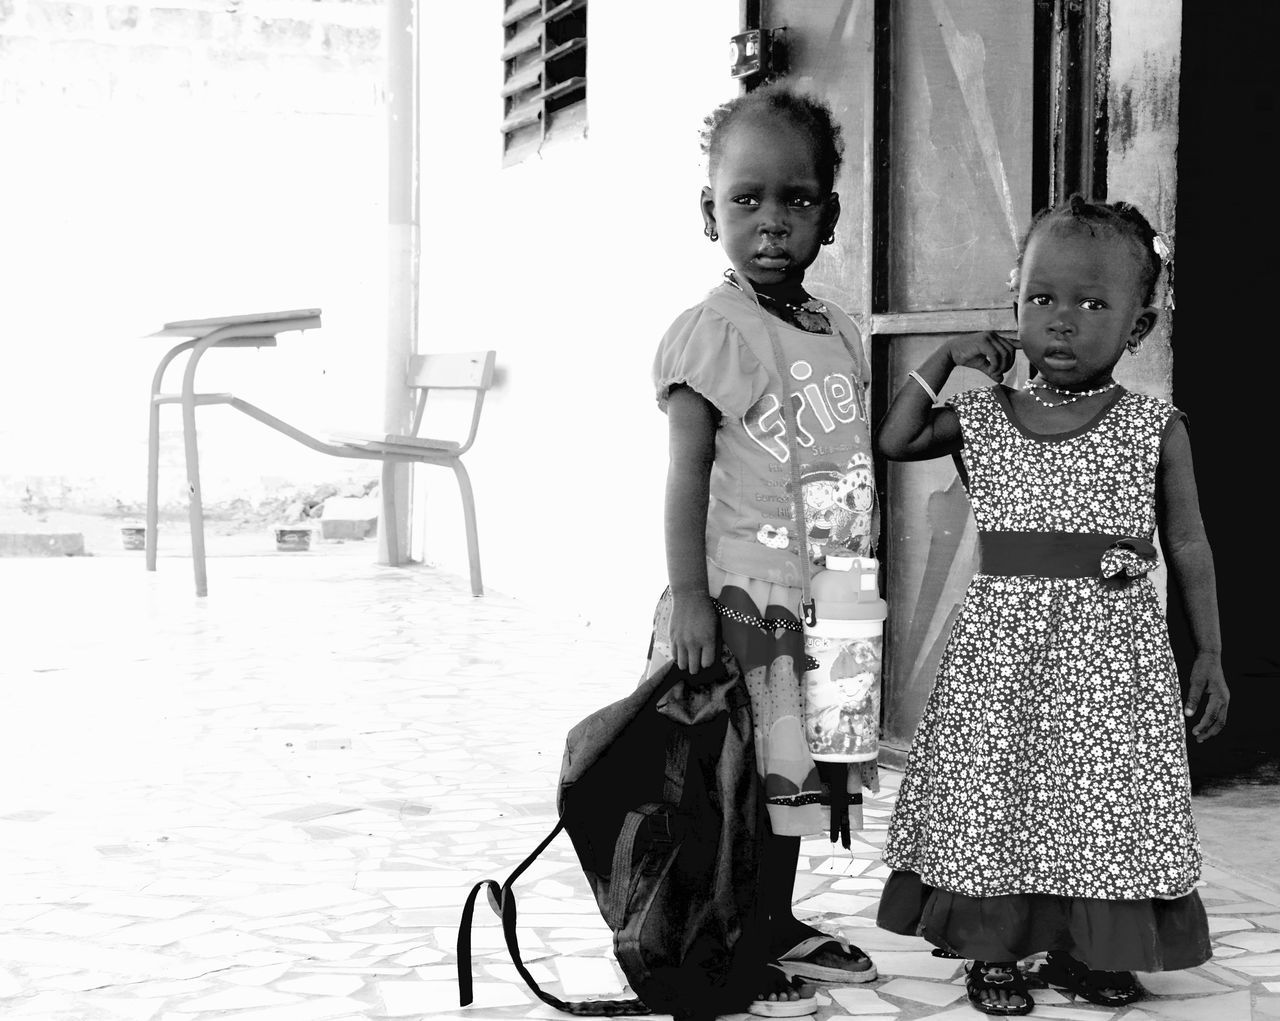 Facetoface African School Portrait Children School Life  Africa Bnwportrait The Portraitist - 2016 EyeEm Awards